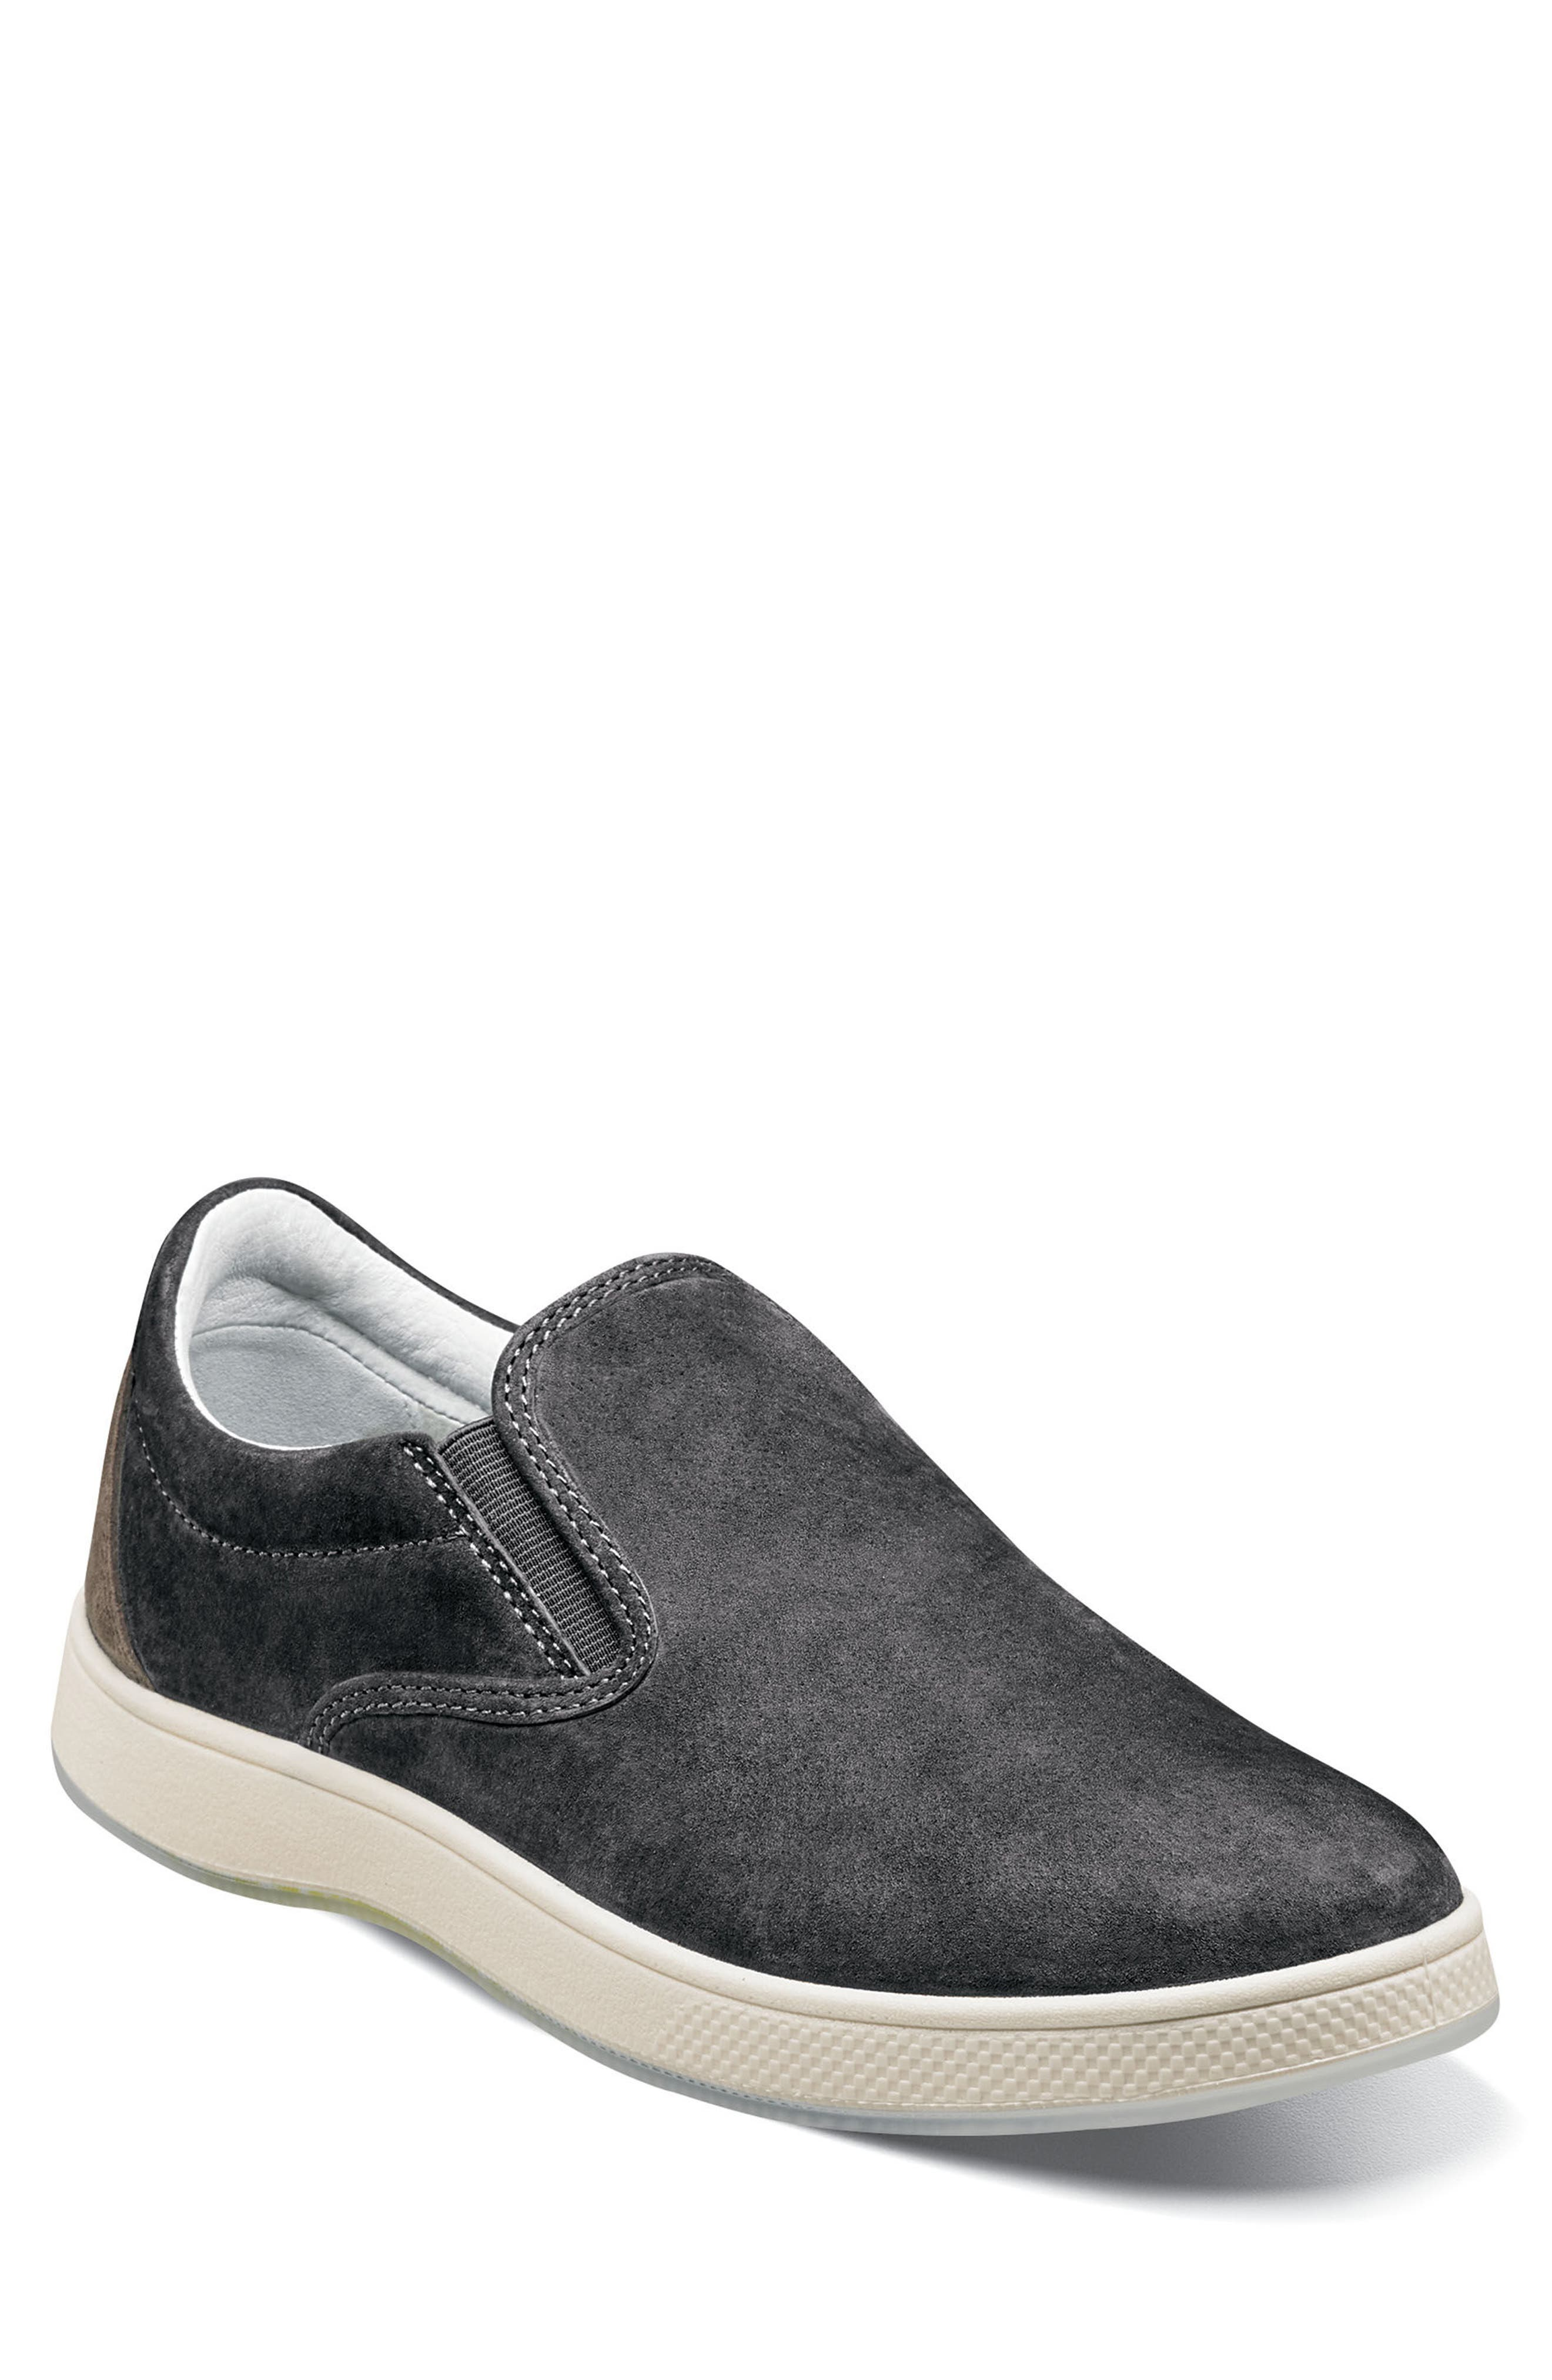 Edge Slip-On Sneaker,                         Main,                         color, Charcoal Nubuck